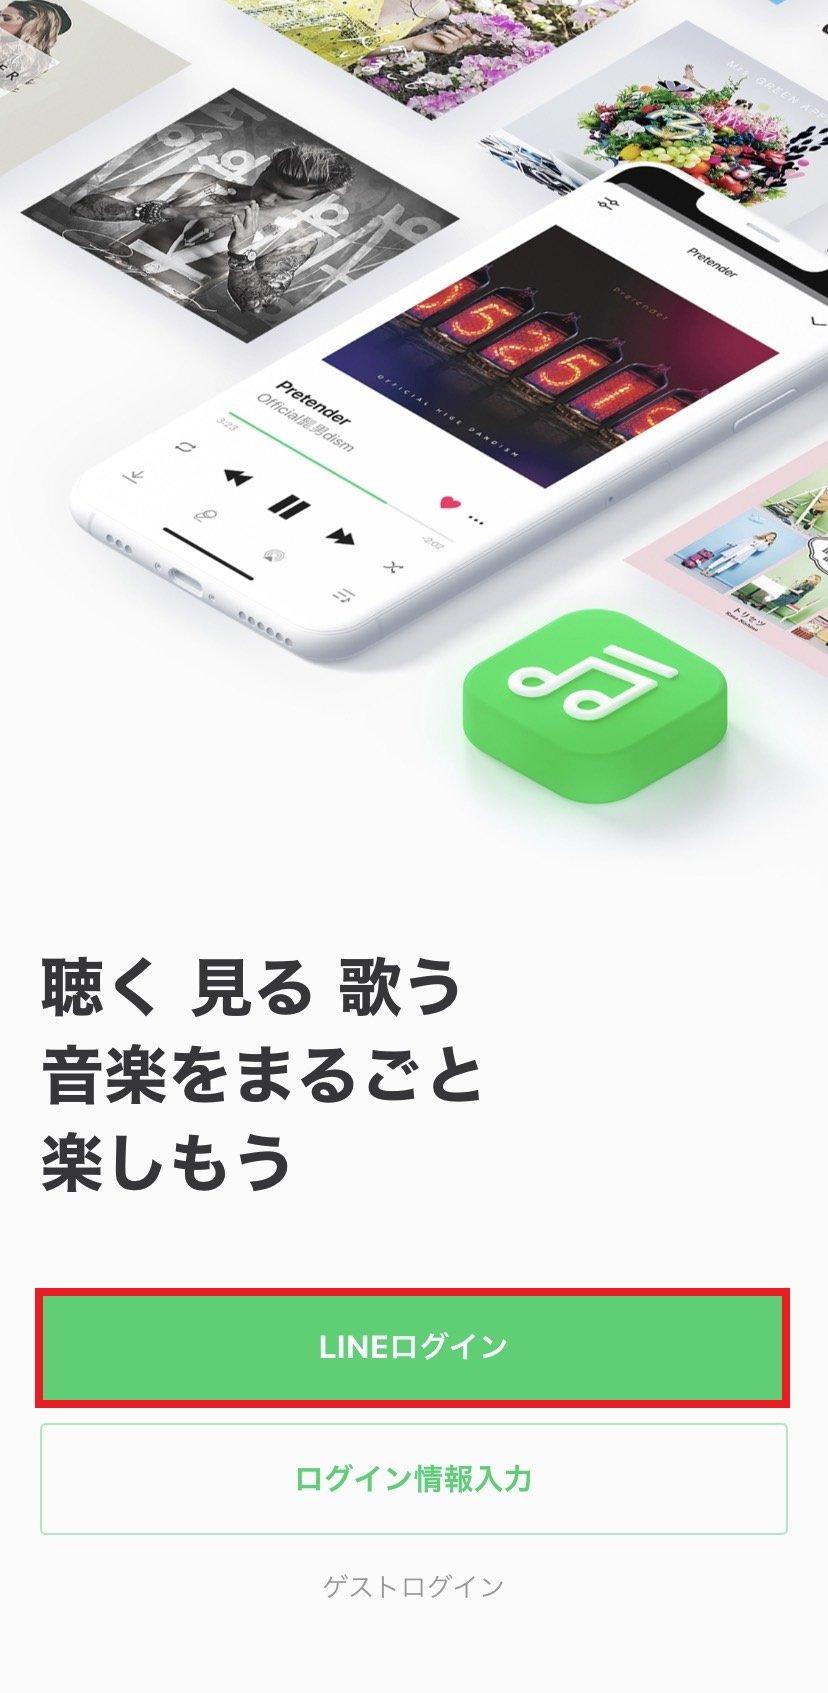 bgm-profile_05.jpg